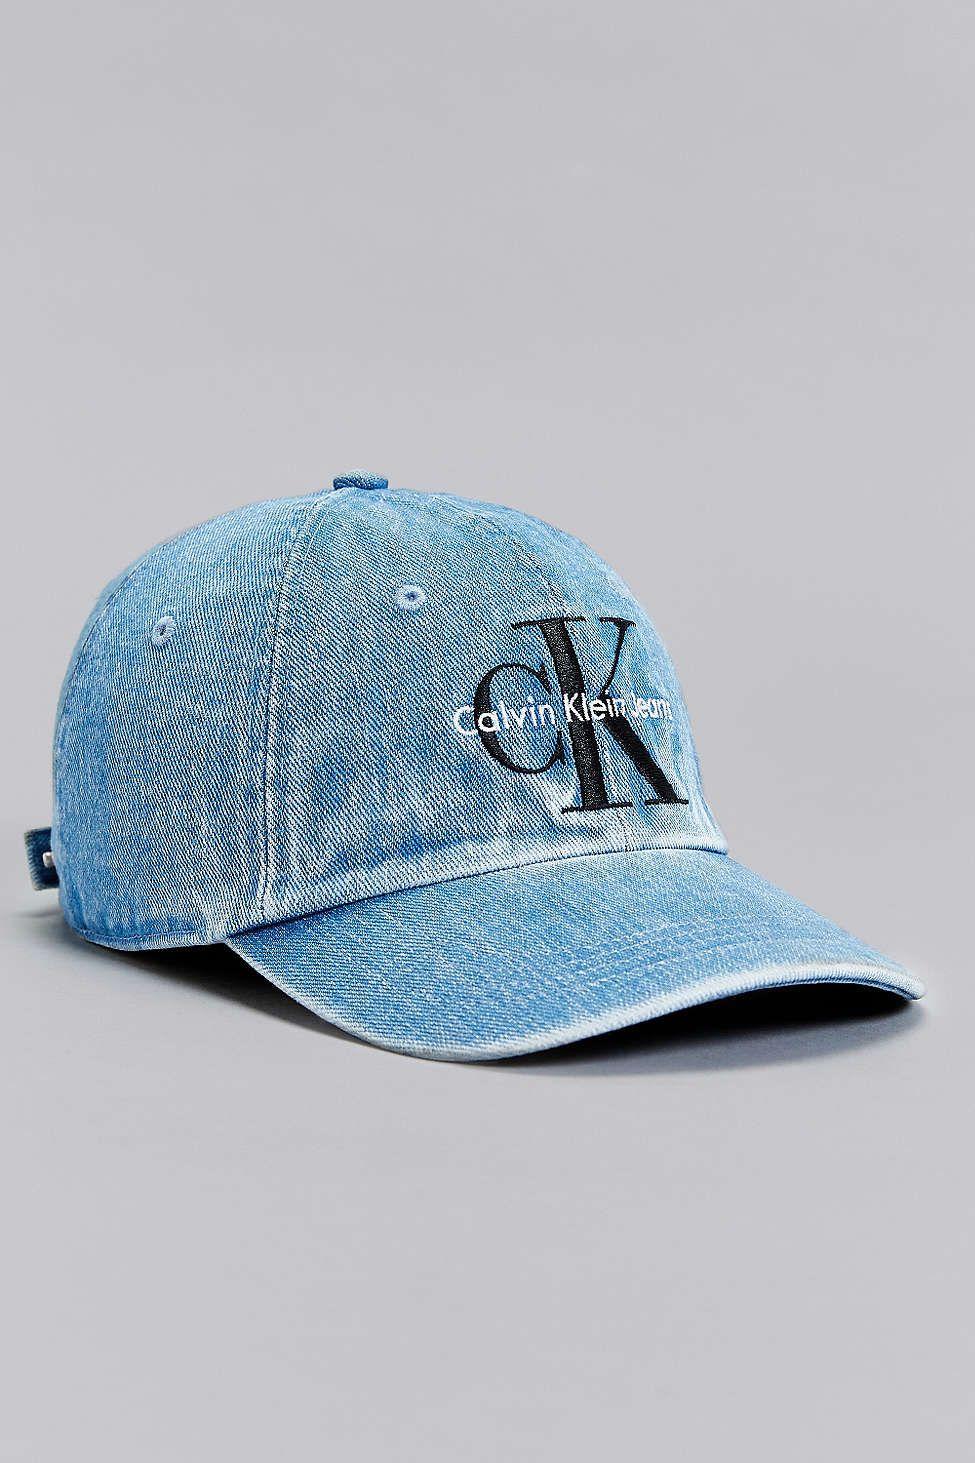 69d644af Calvin Klein Baseball Hat | baseball caps | Baseball hats, Outfits ...